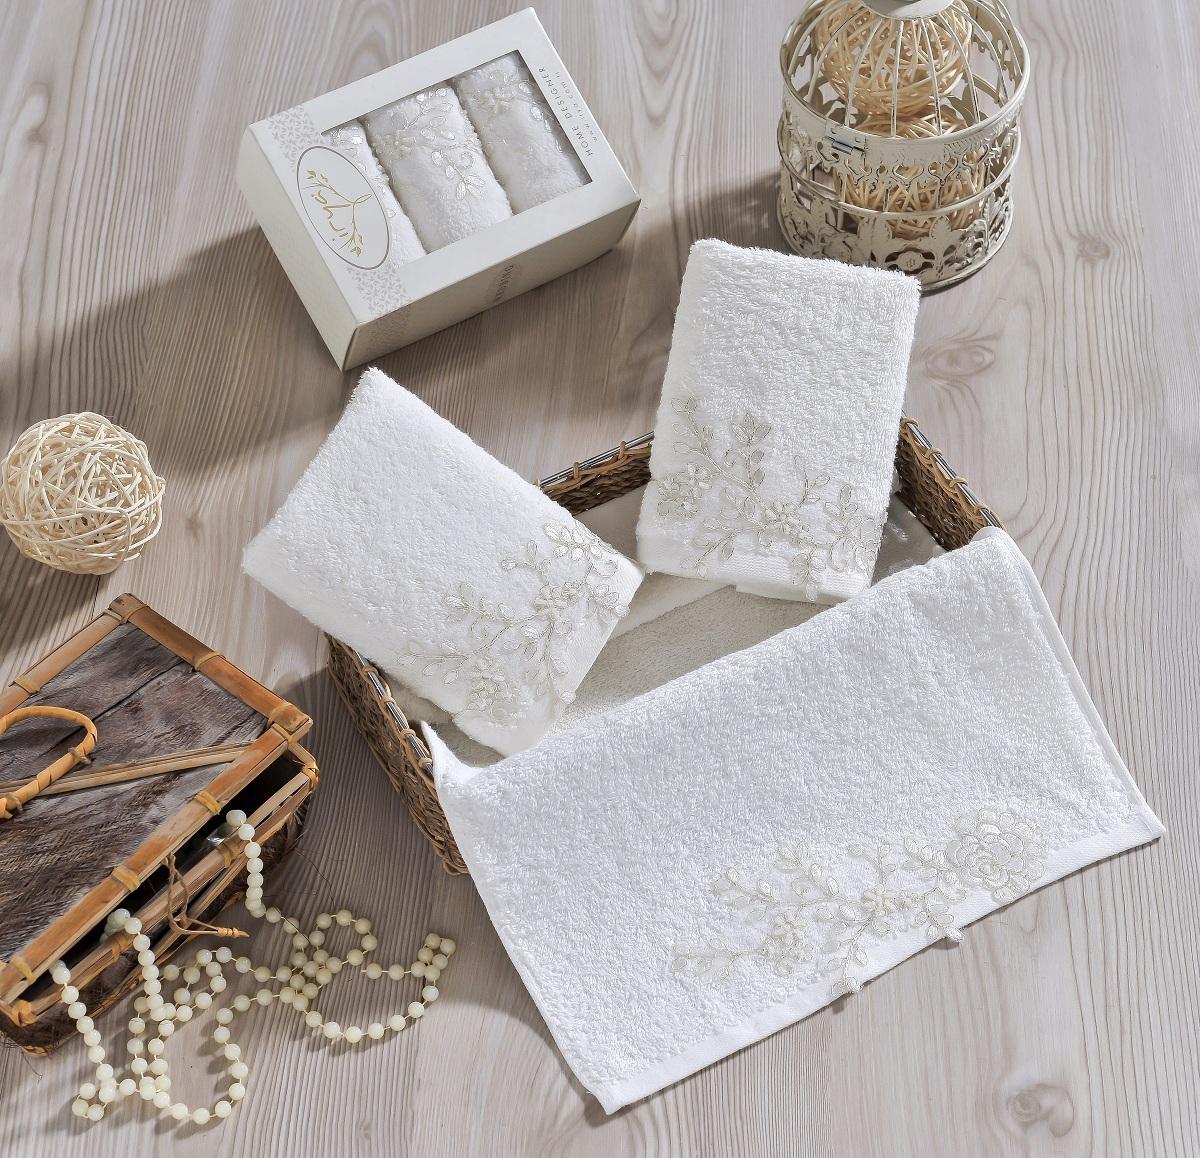 Полотенца IRYA Полотенце Sensitive Цвет: Молочный (30х50 см - 3 шт) полотенца банные spasilk полотенце 3 шт